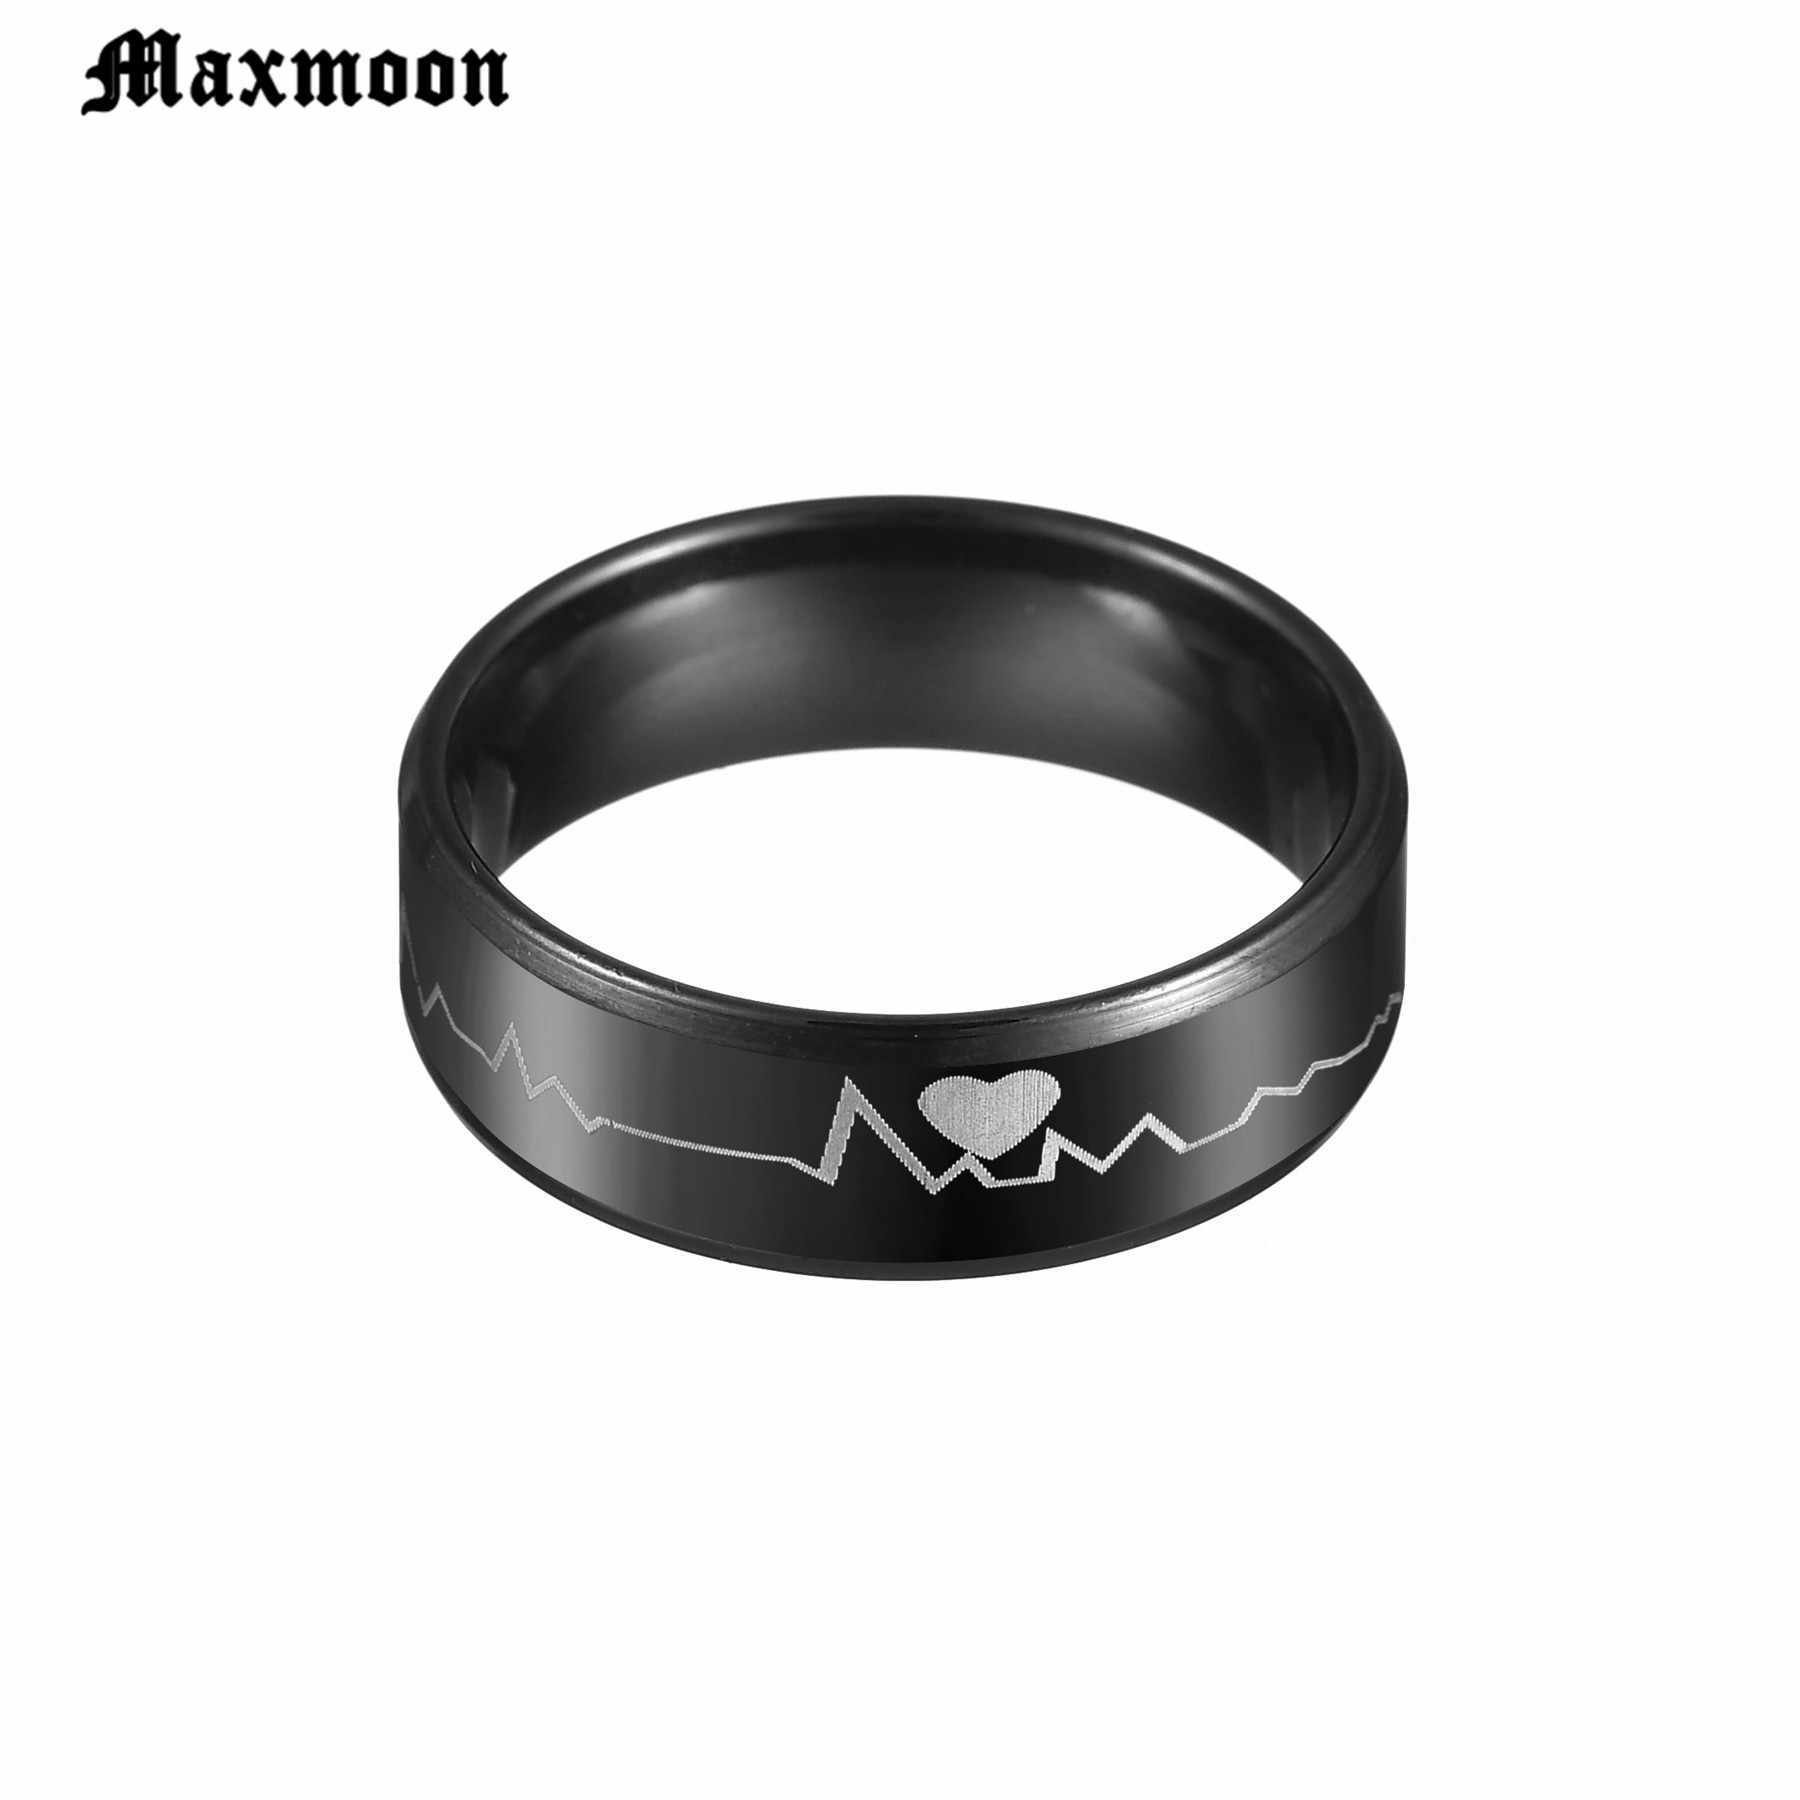 Maxmoon 8 มิลลิเมตรสีดำสแตนเลส Heartbeats Cardiogram แหวนหมั้นค็อกเทล Promise Lover คู่